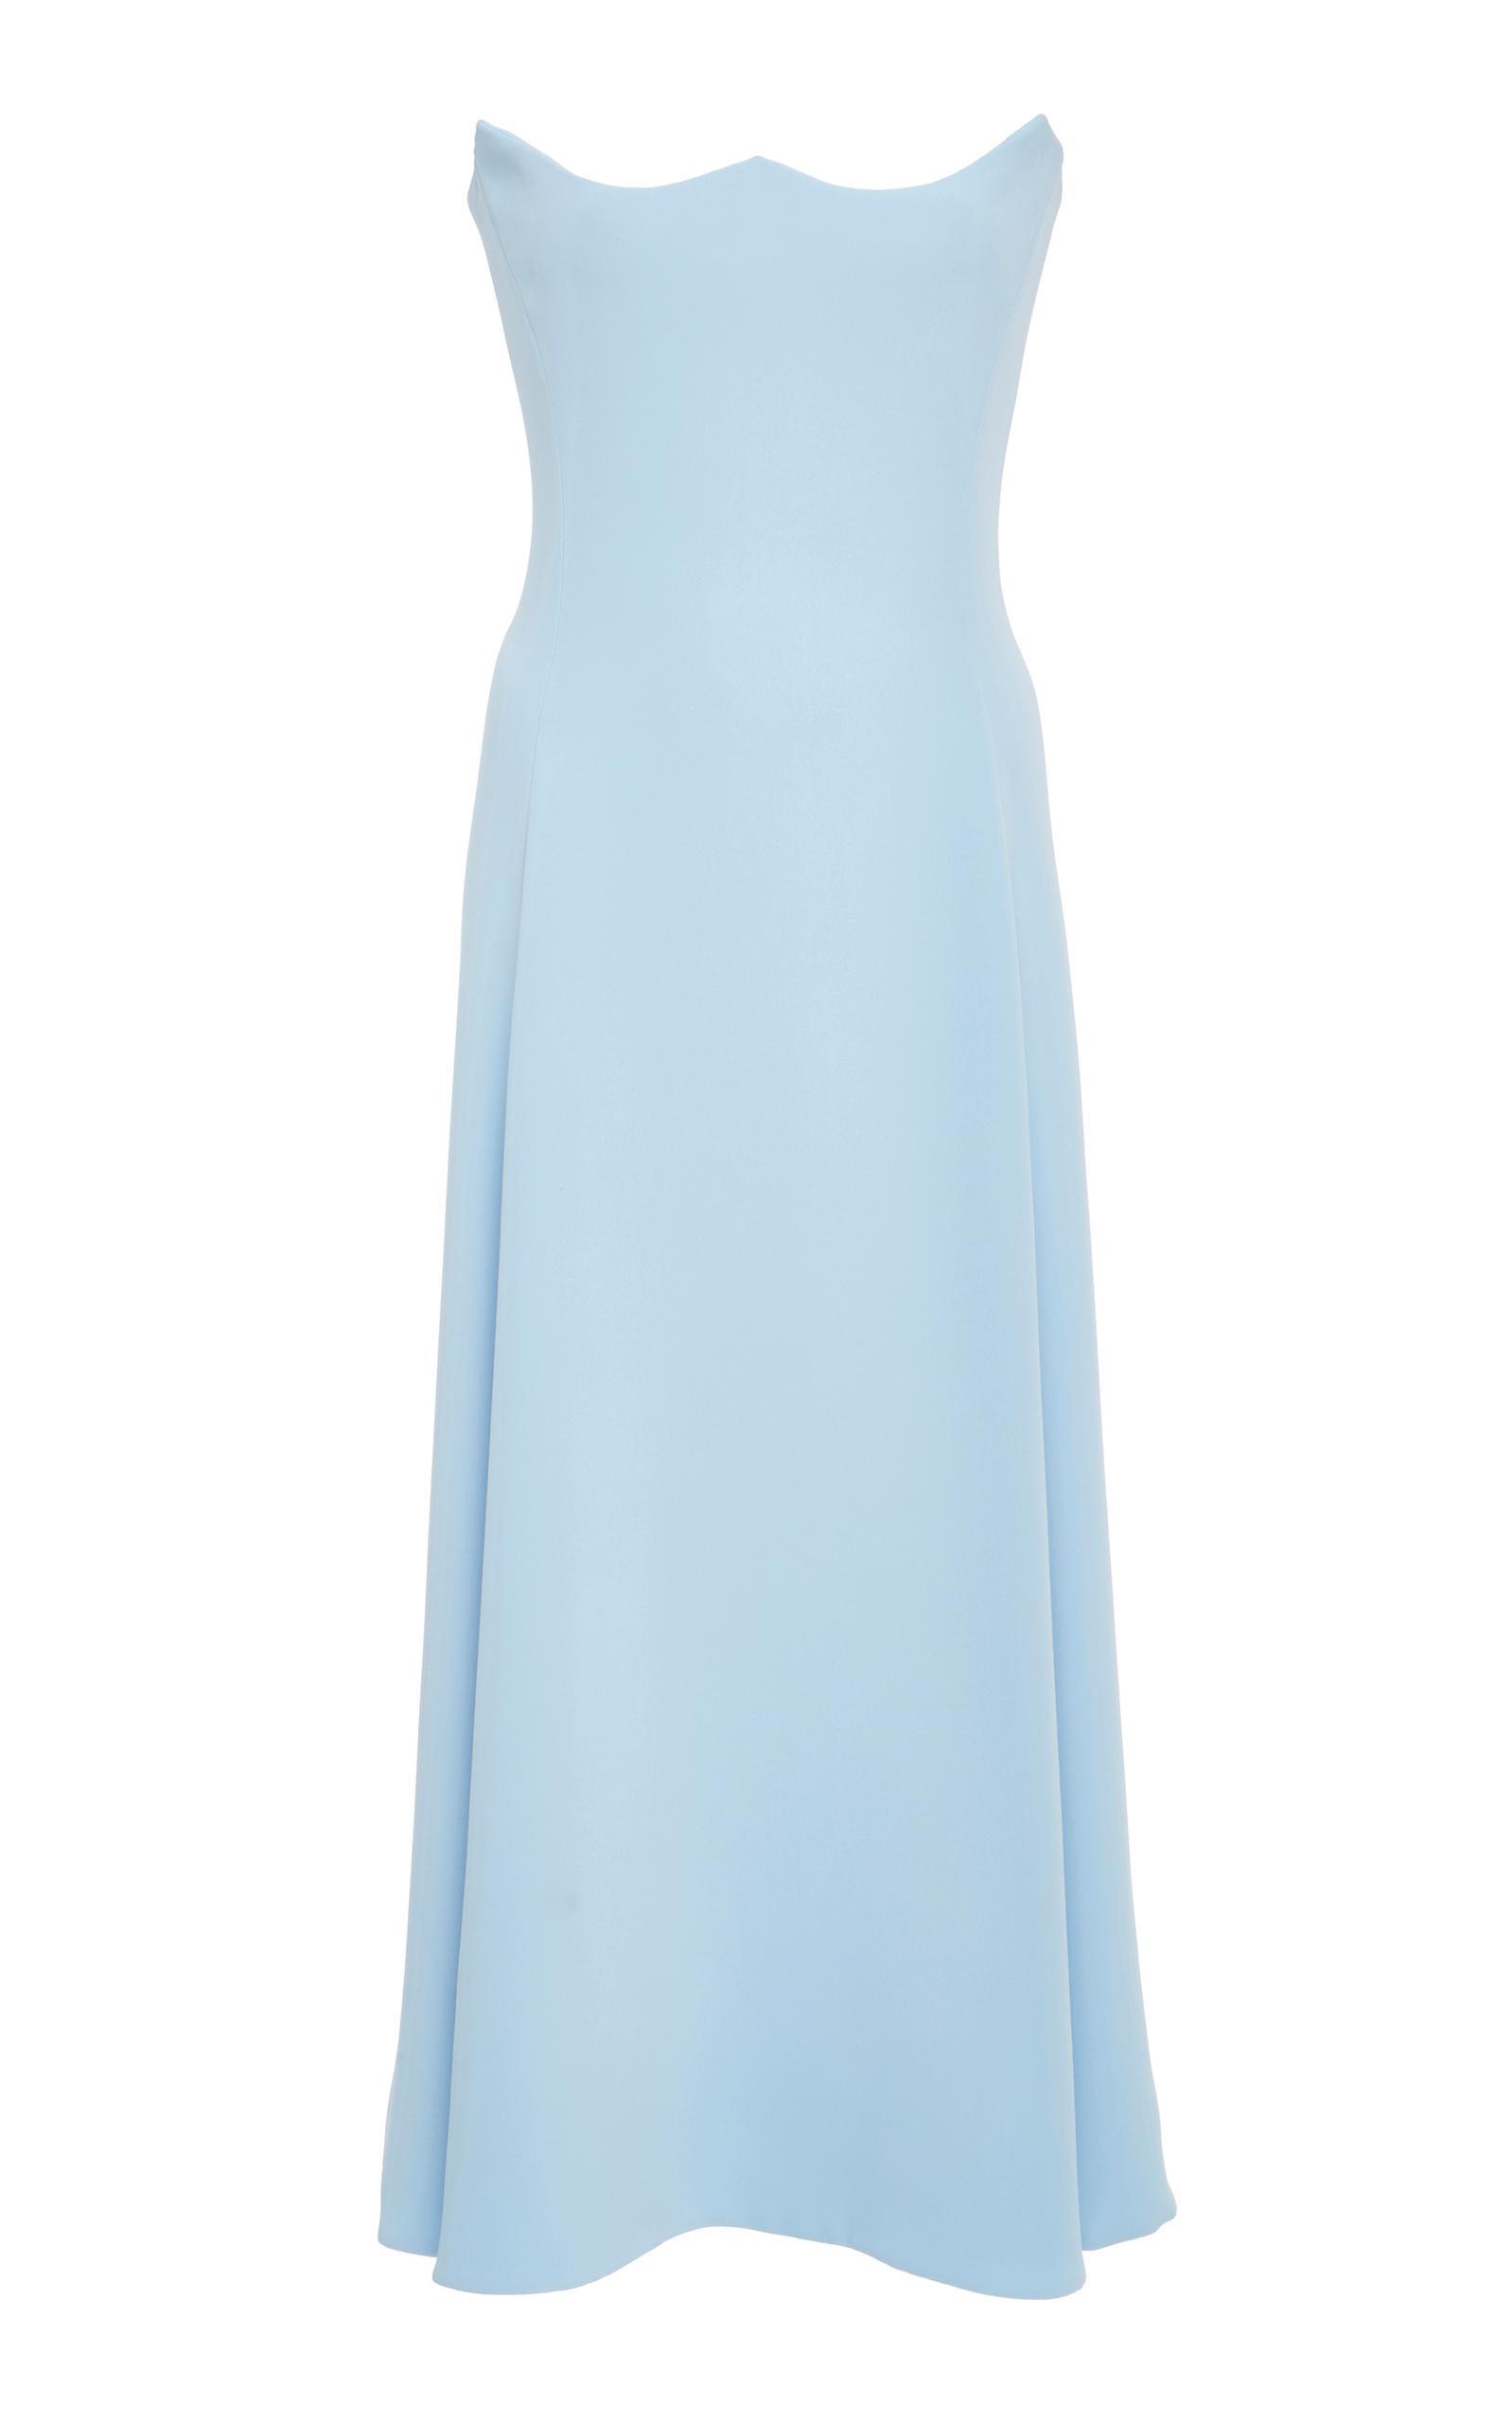 Versace Strapless Silk Dress In Blue